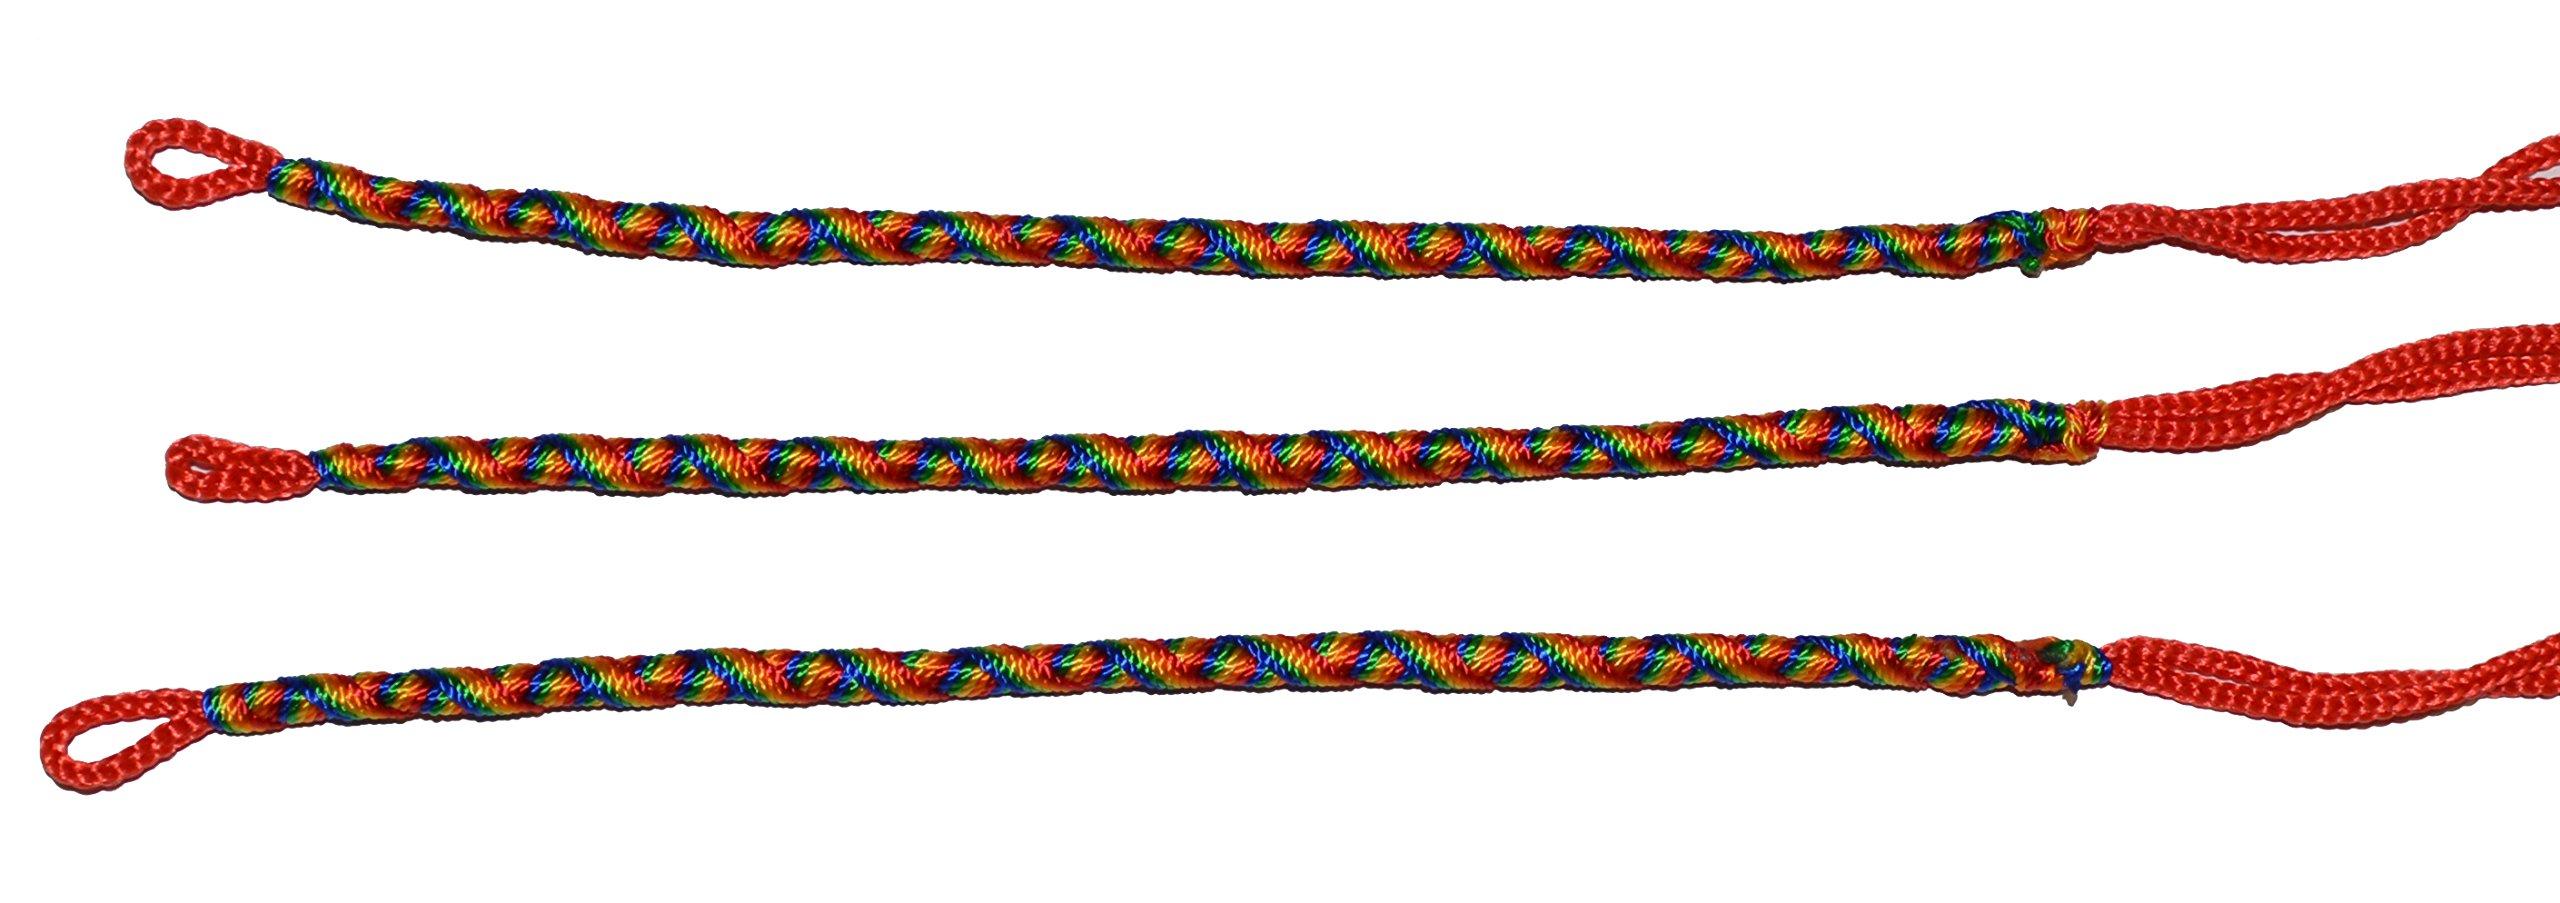 Rainbow Friendship Bracelets LOT 100 MIX From Peru Wholesale GAY Lesbian Pride by Handmade In Peru (Image #4)